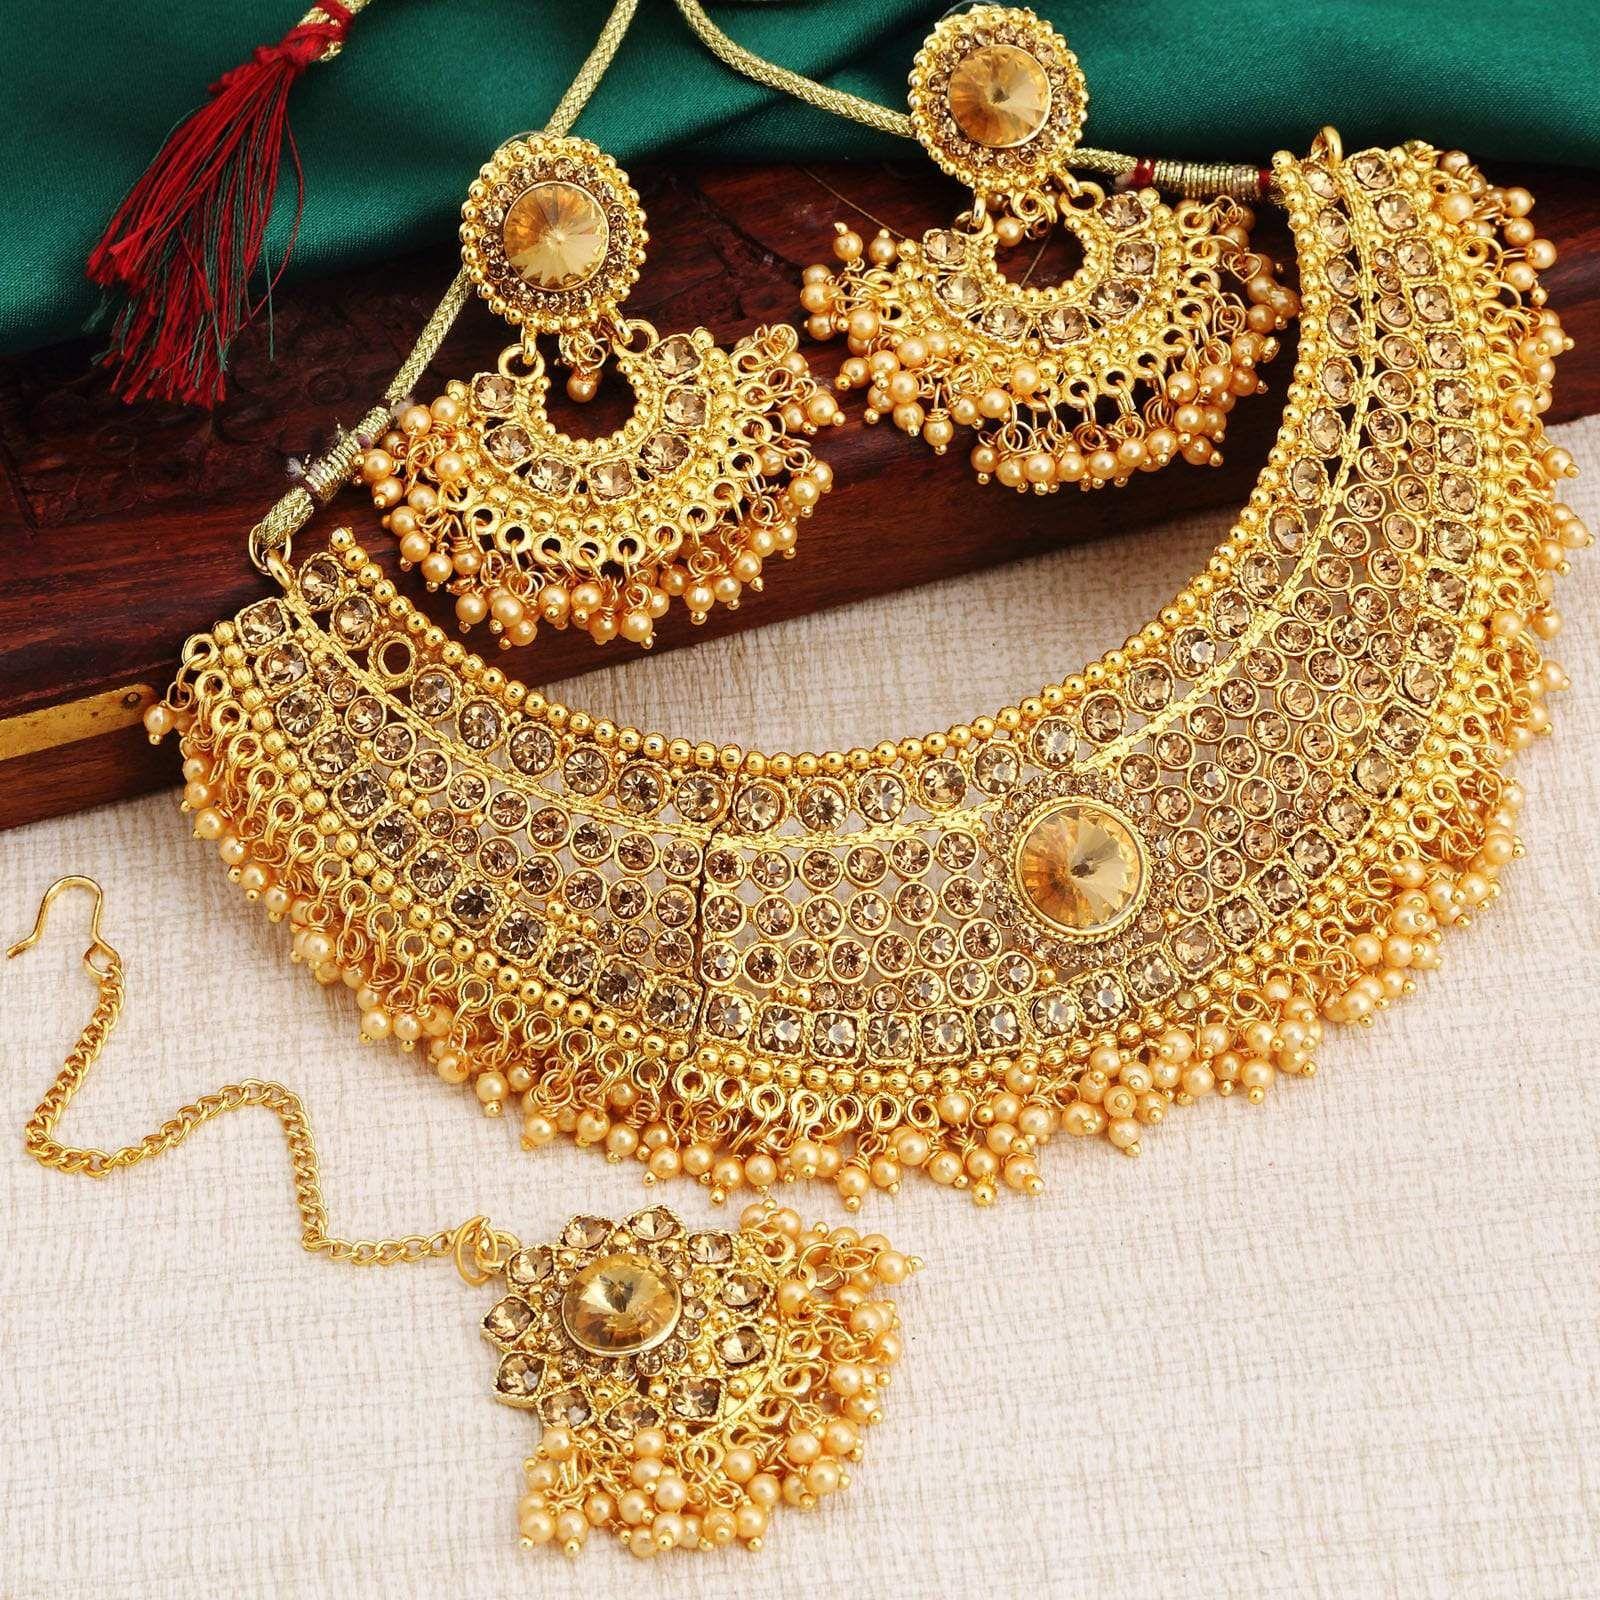 Indian Bollywood Ethnic Golden Kundan Choker Necklace Earrings Tikka Jewelry Set